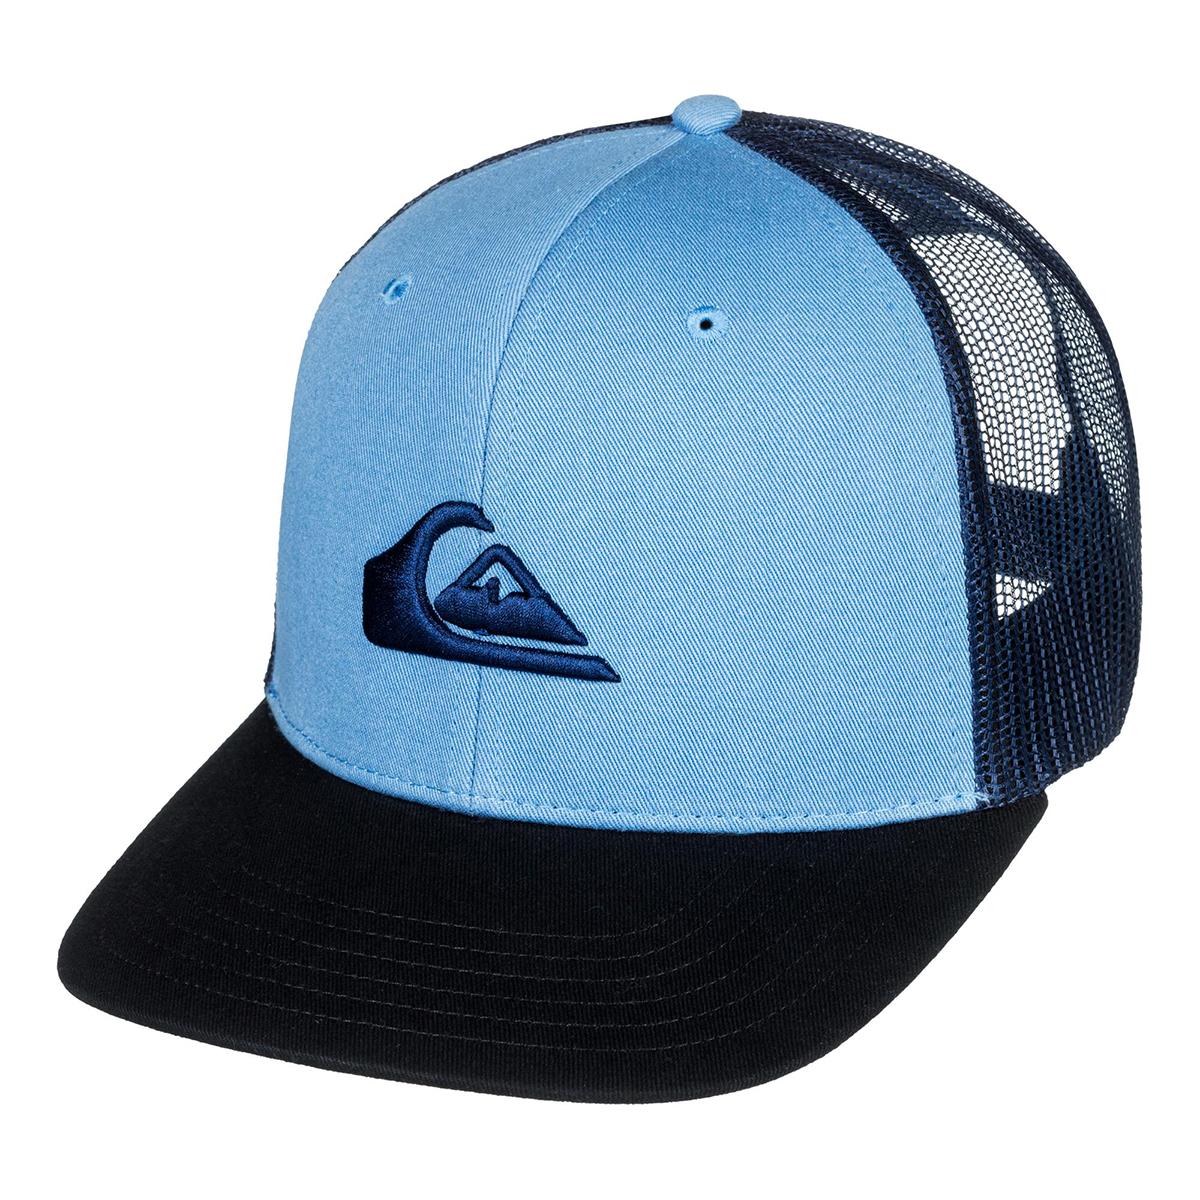 size 40 c2318 09bab Details about Quiksilver Men s Grounder Trucker Adjustable Hat Dusk Blue